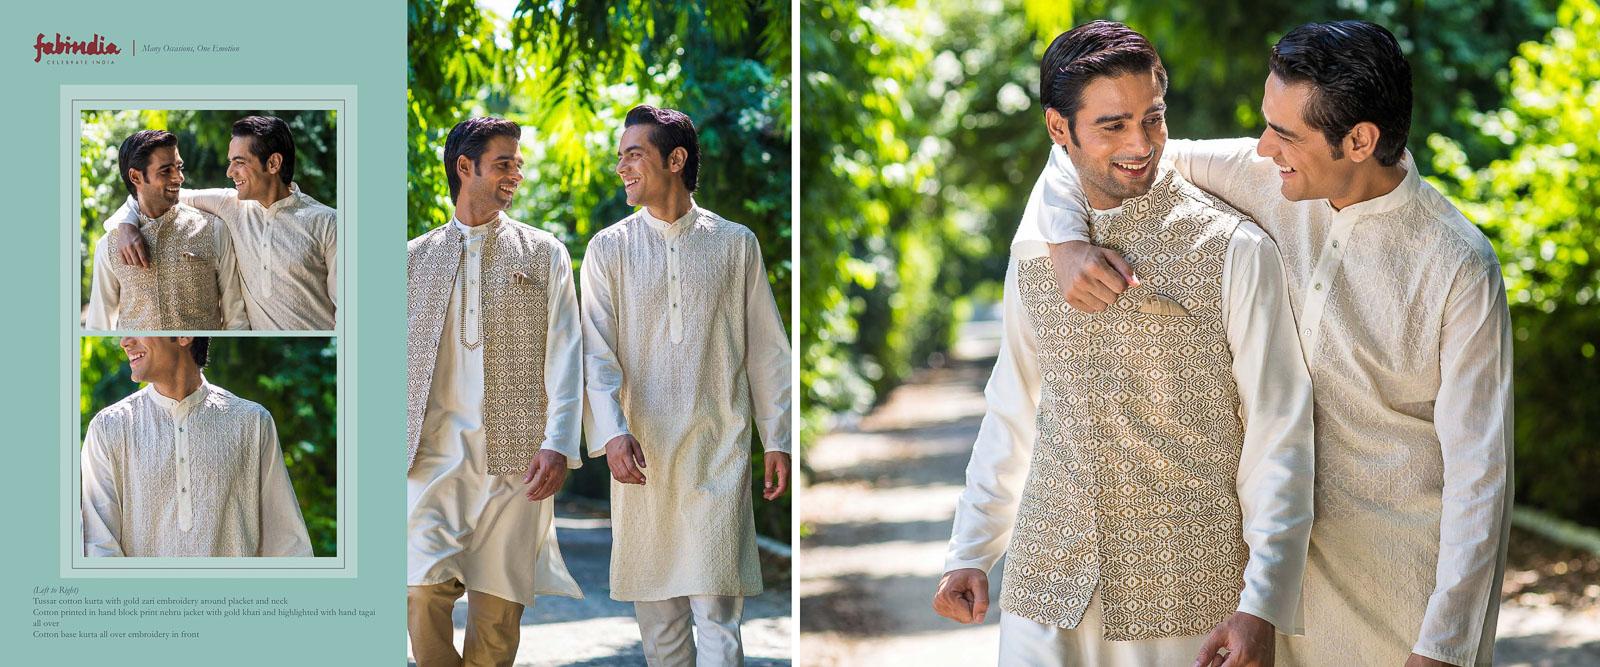 Fashion-Photographer-Fabindia-Ethnic-RamitBatra_04